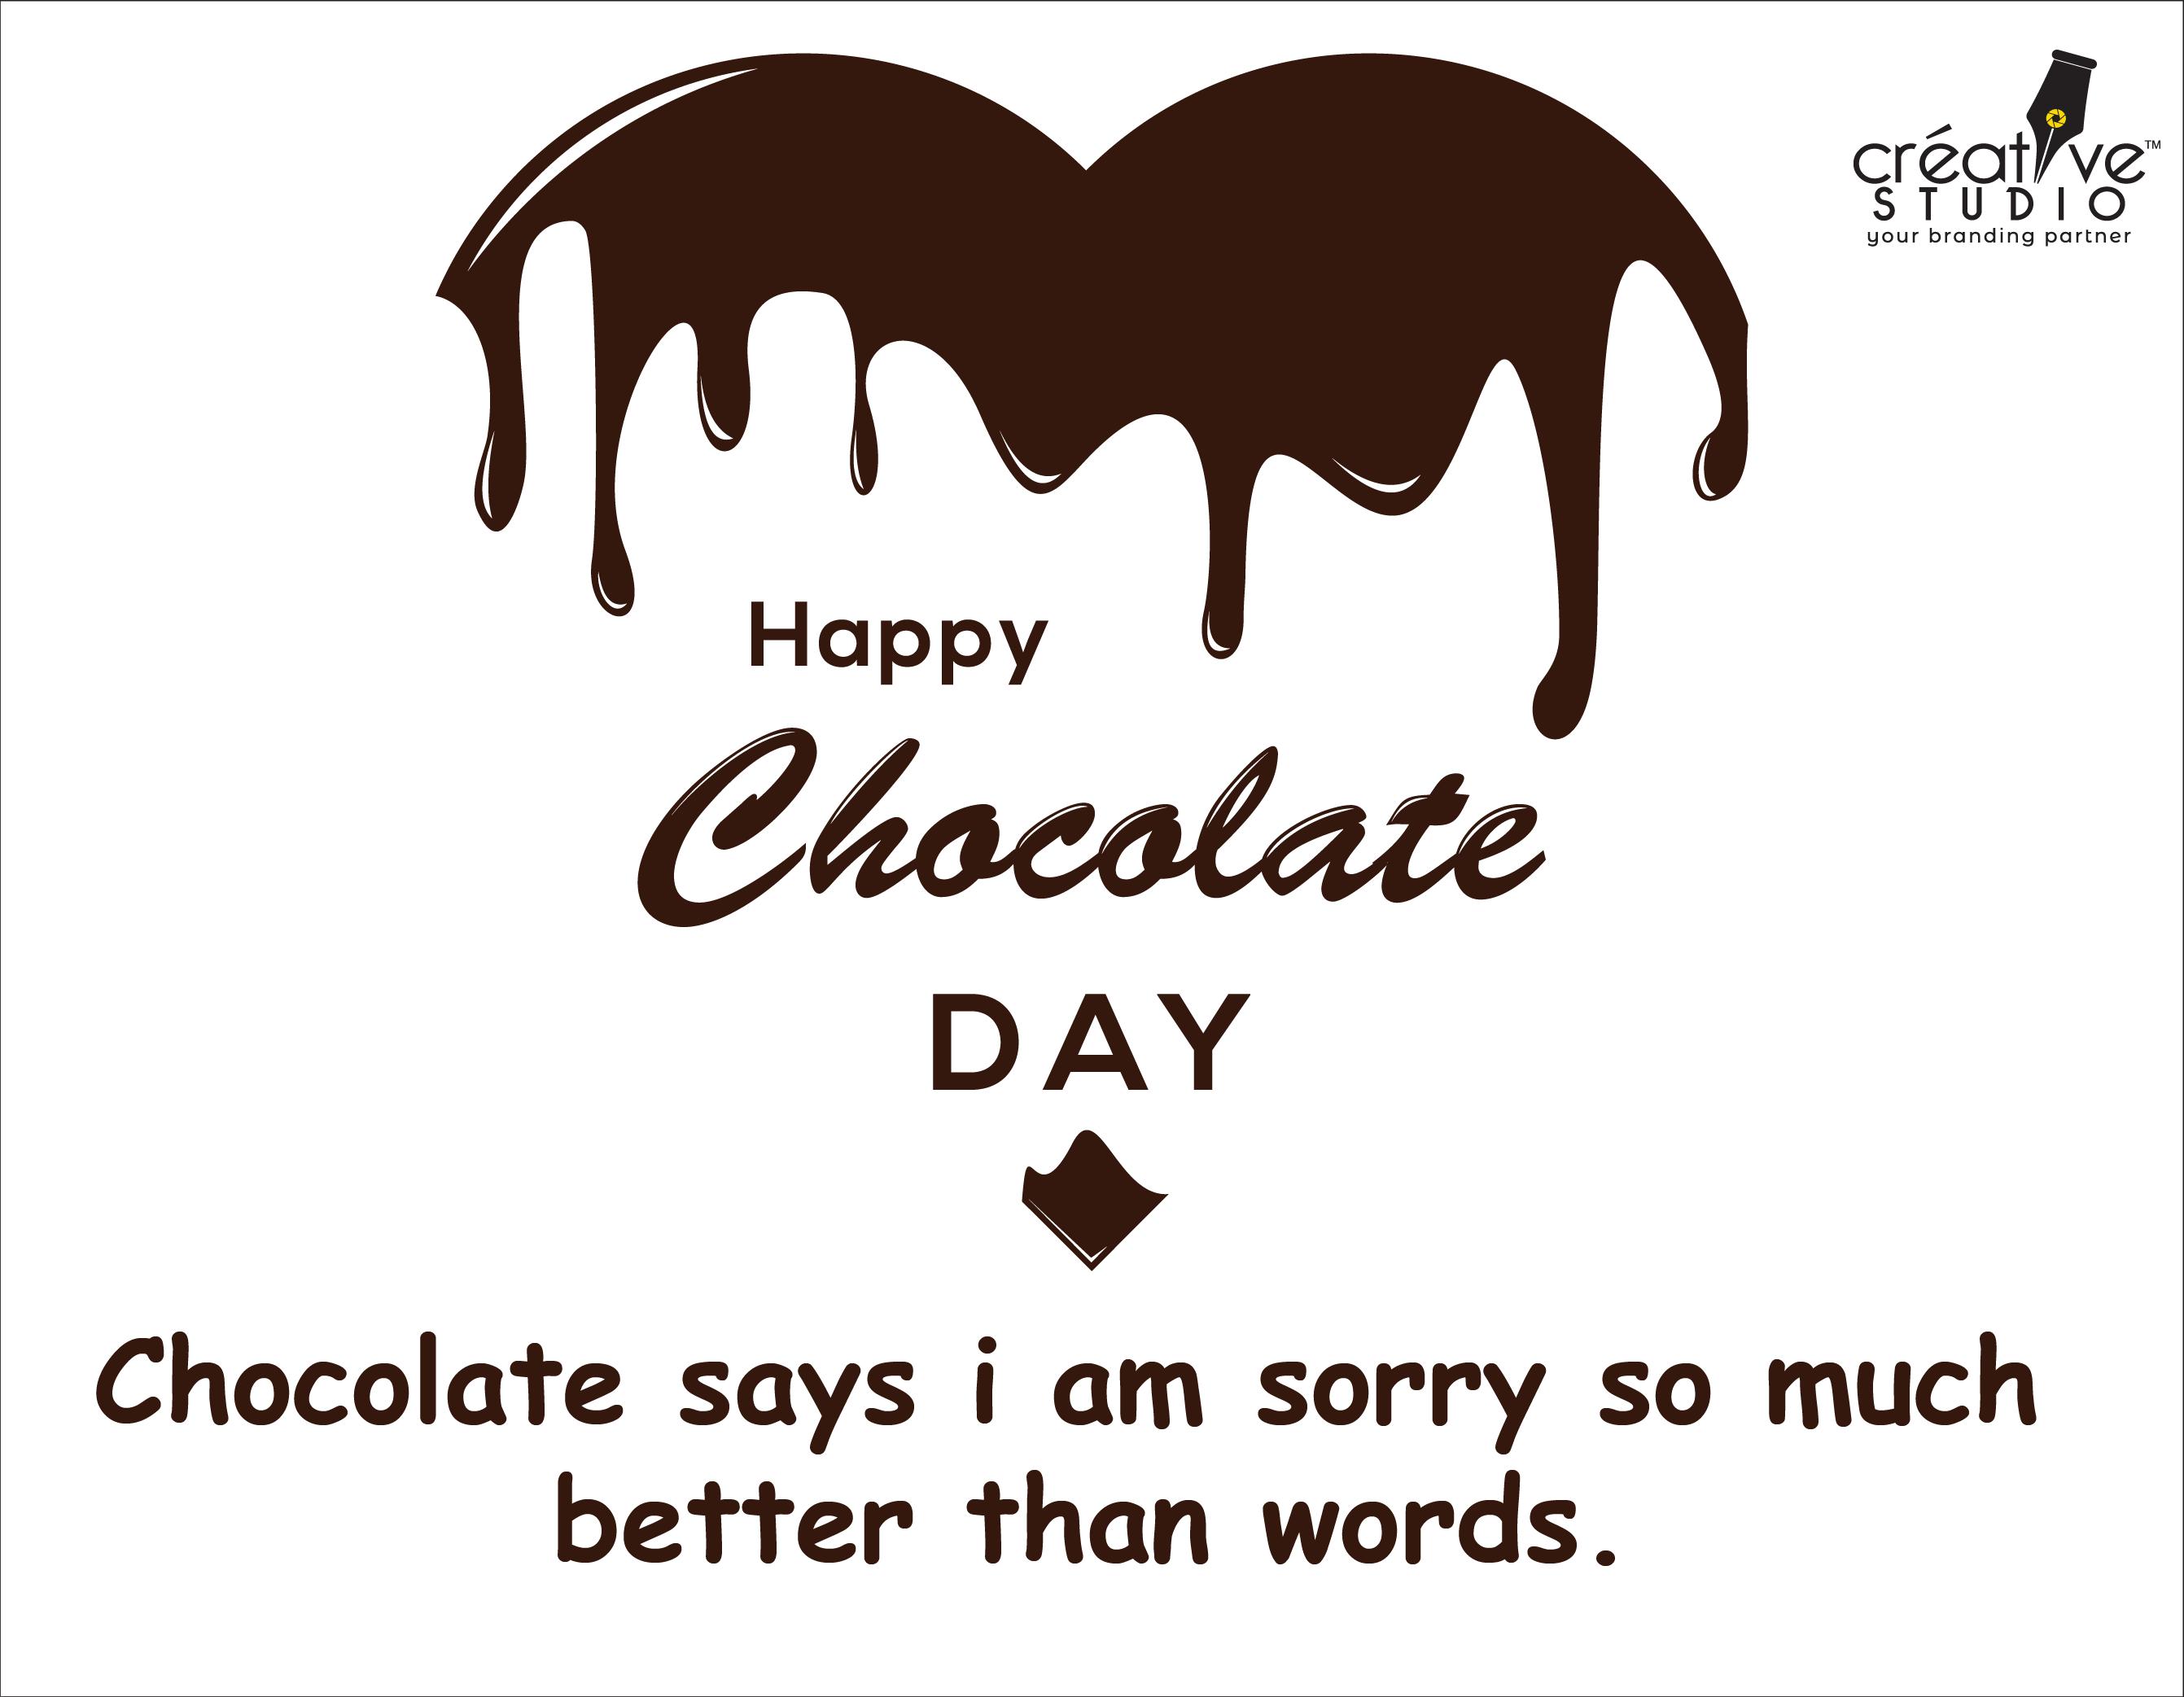 CHOCOLATE DAY 05 - Chocolate